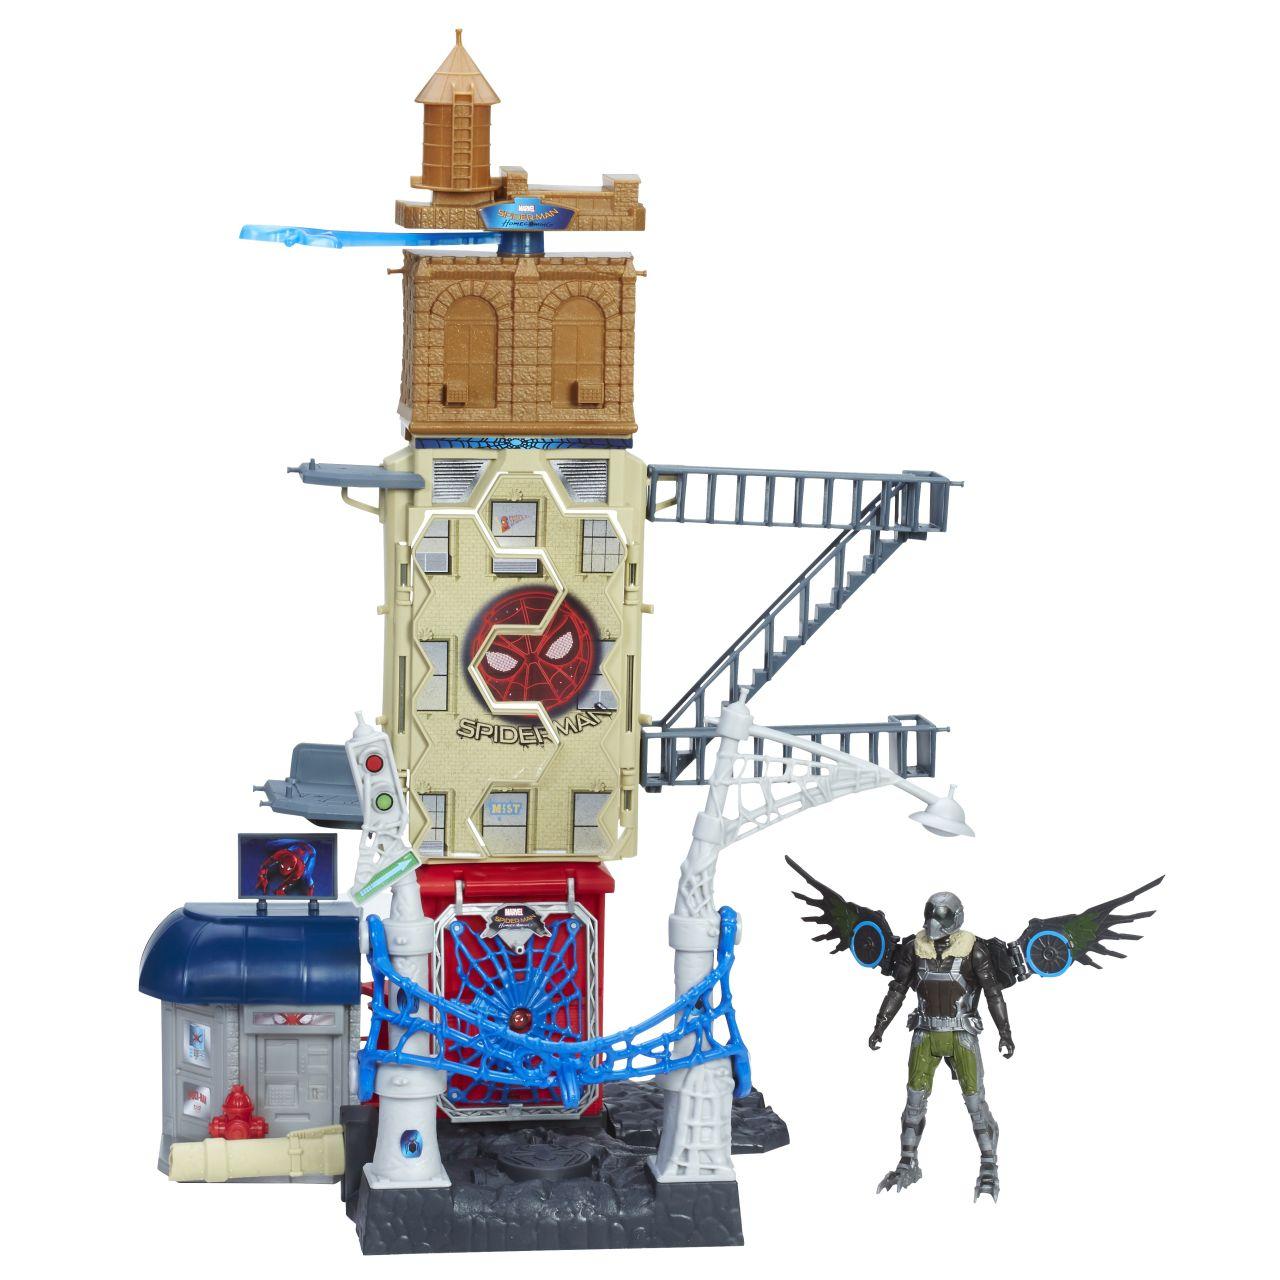 Spider man homecoming les premiers jouets du film for Siege lego france